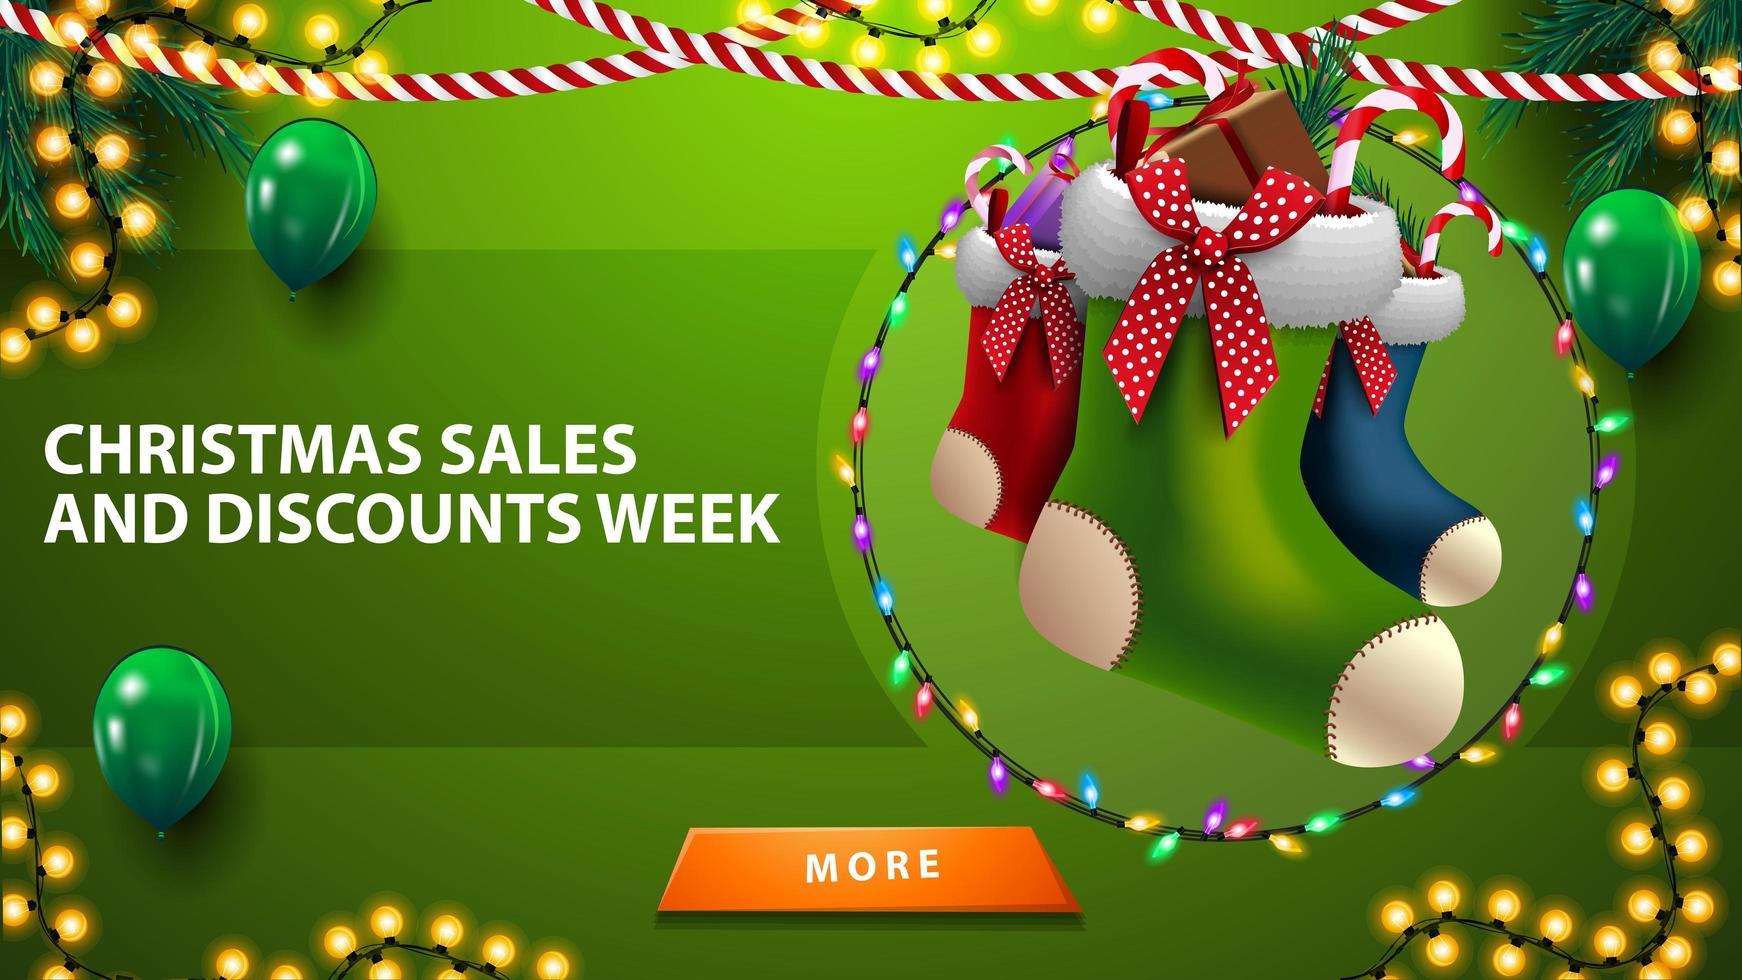 kerstverkoop en kortingsweek, horizontale groene kortingsbanner met ballonnen, slingers, kerstsokken en knop vector